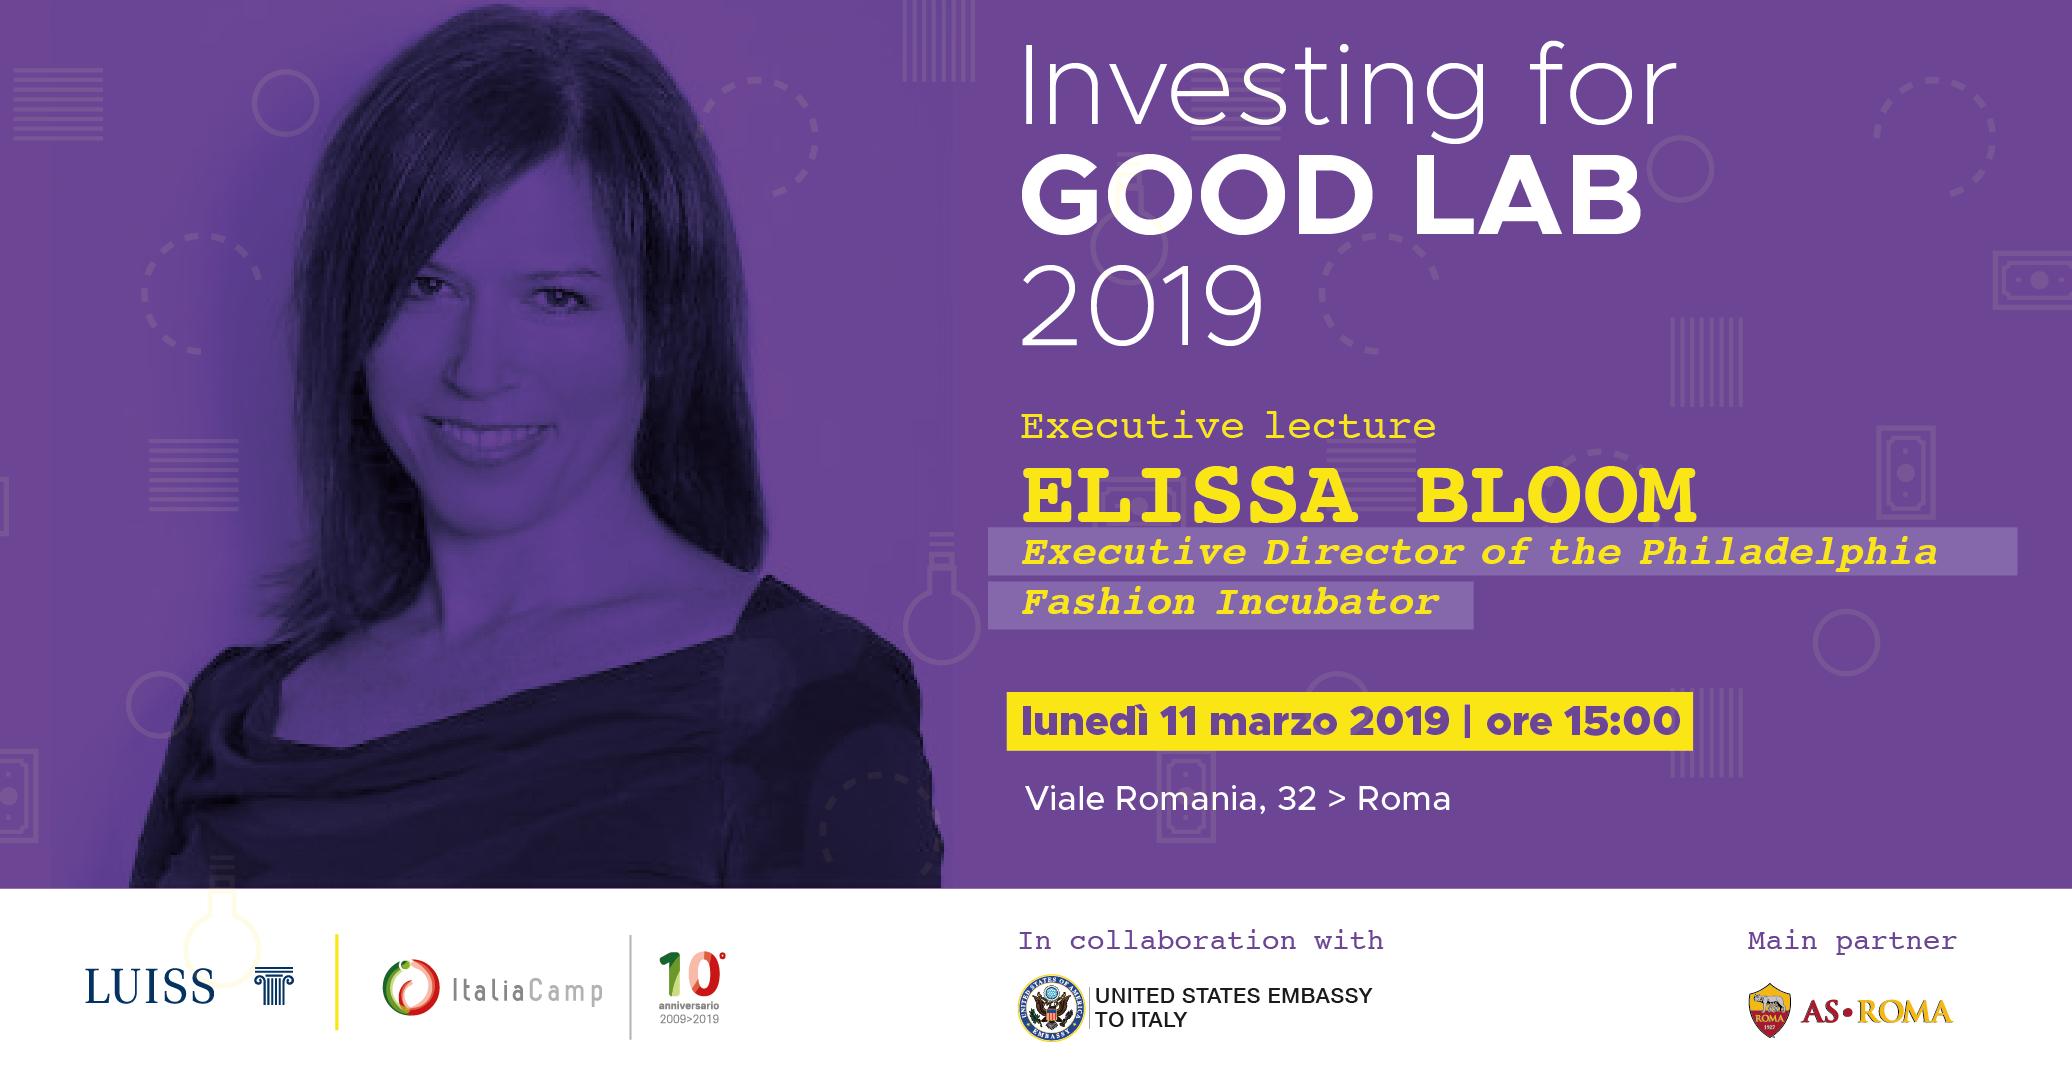 Elissa Bloom ospite dell'Investing for Good di ItaliaCamp